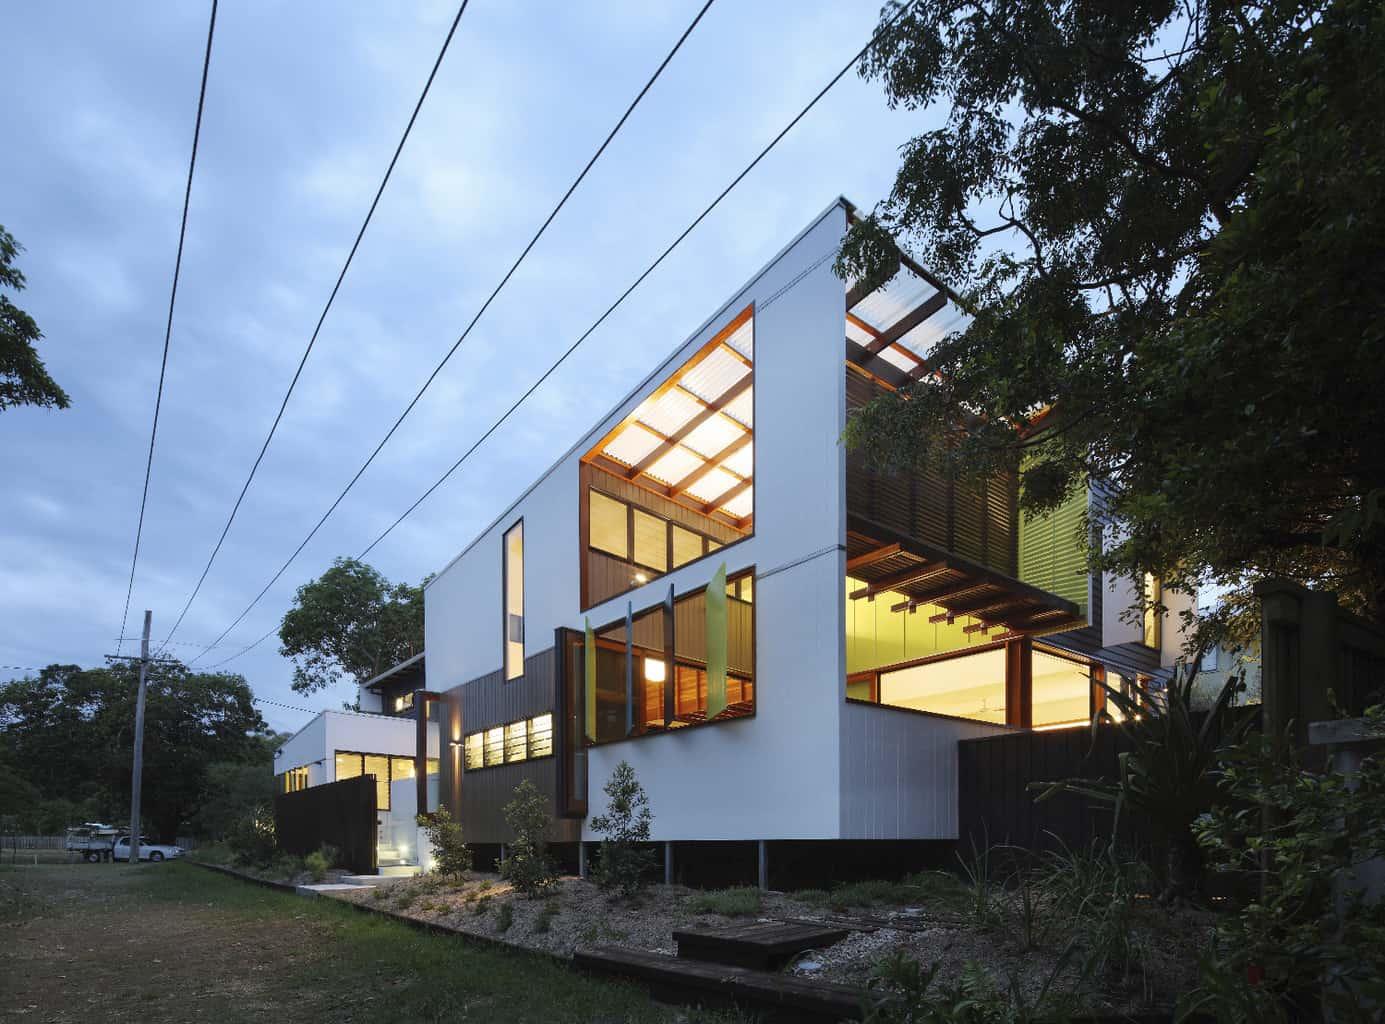 Pod style architecture on Stradbroke Island